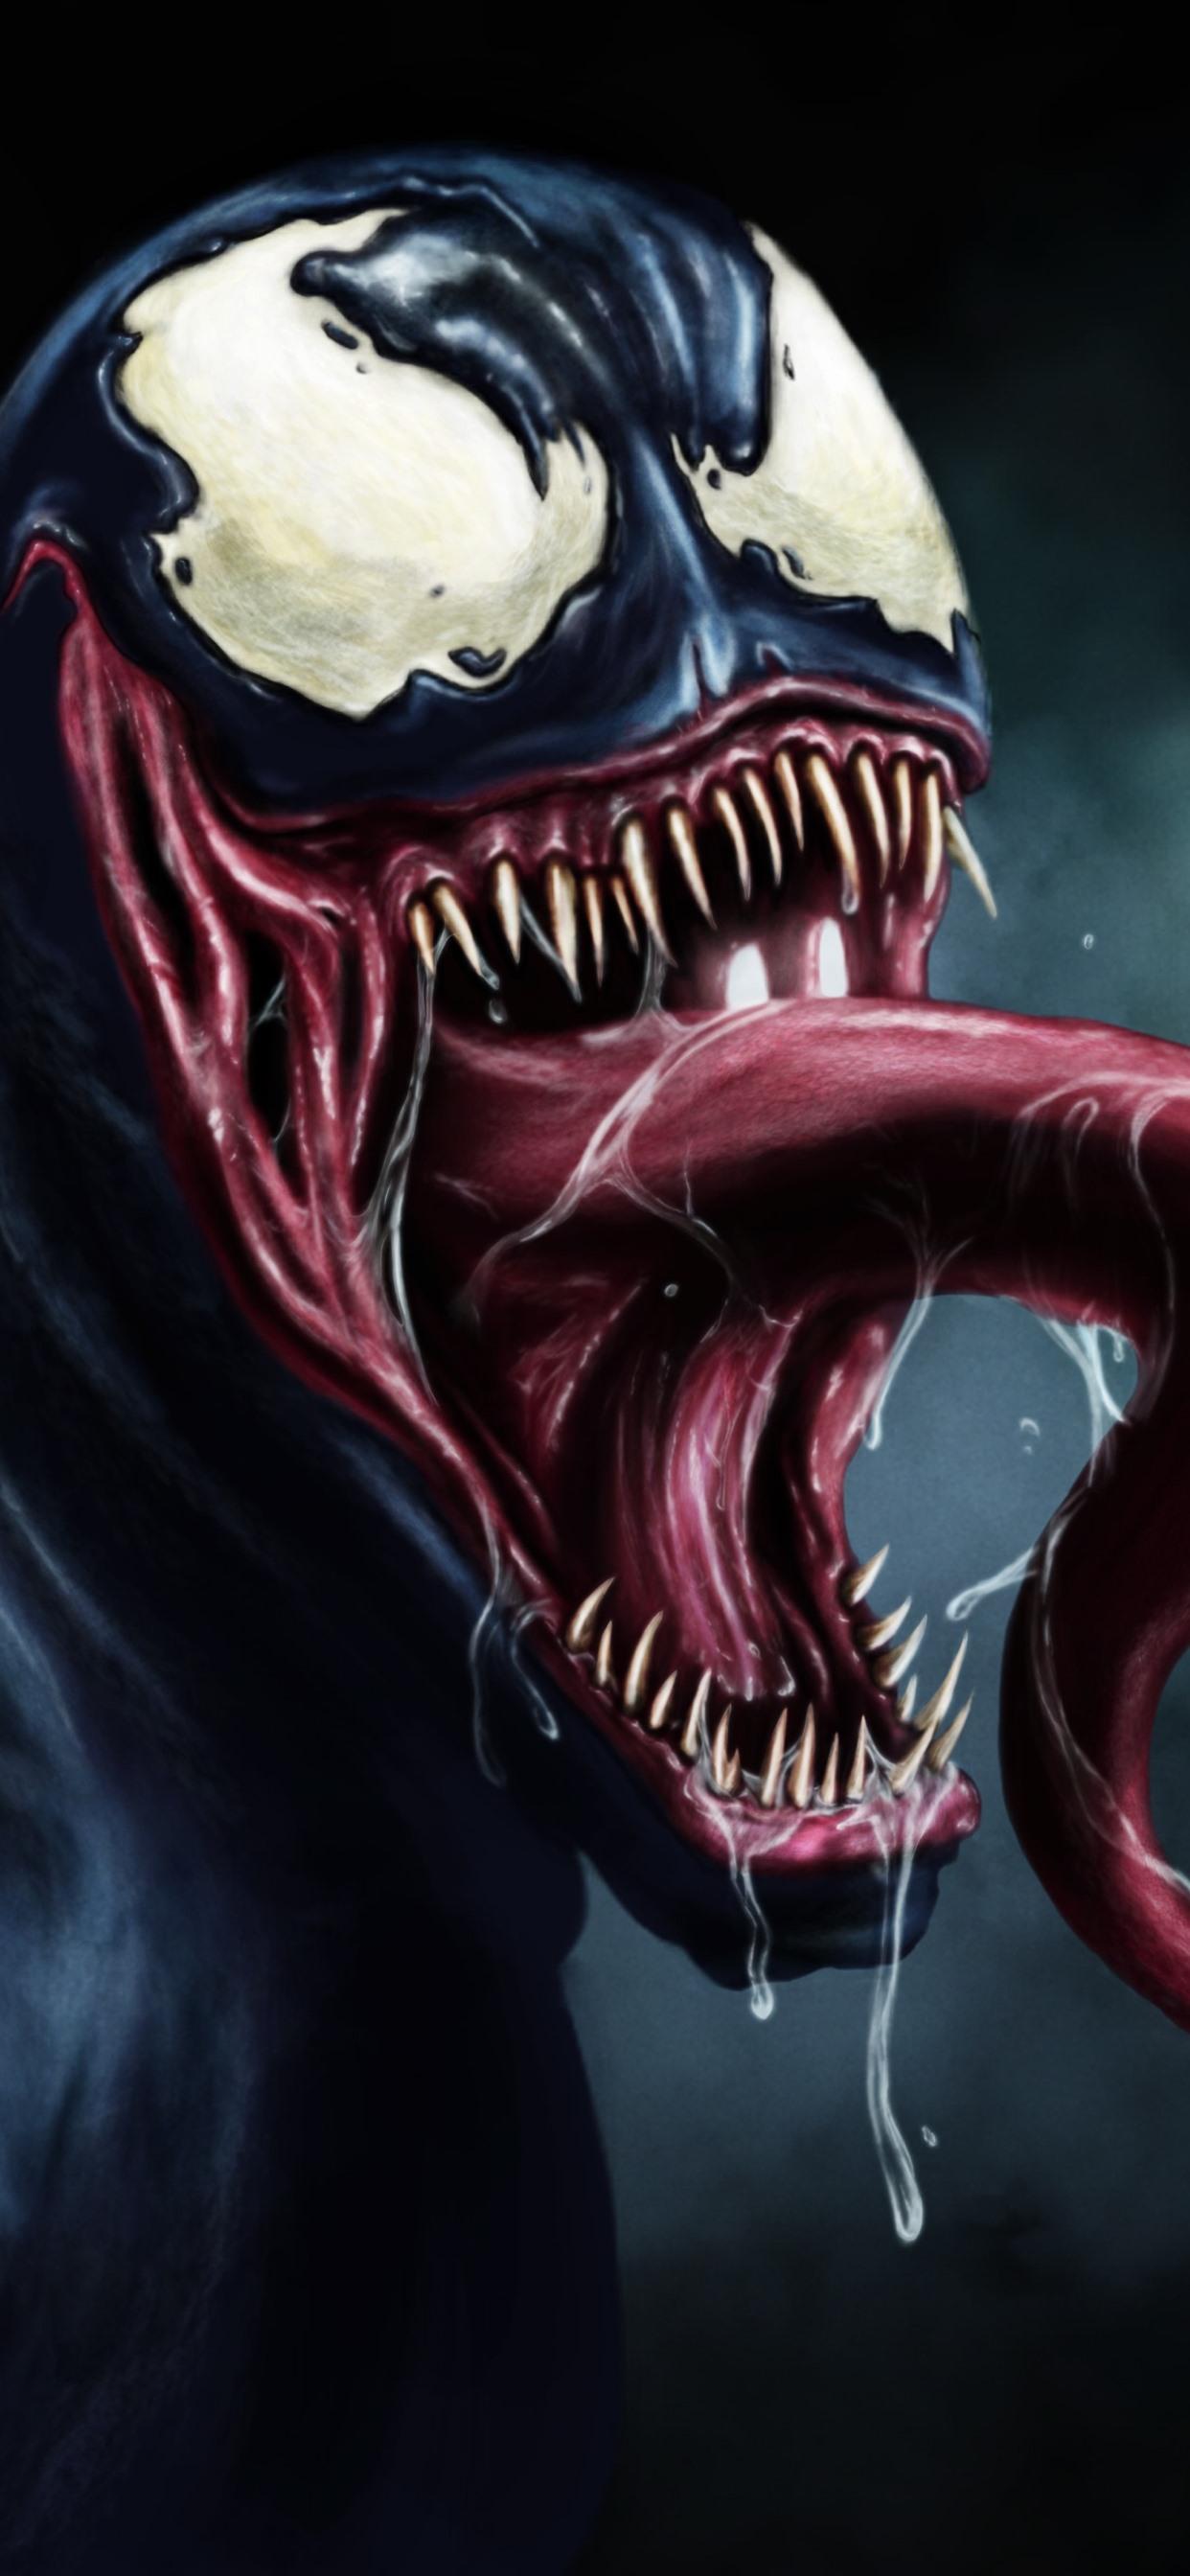 Venom Dc Comics Art Picture Black Background 1242x2688